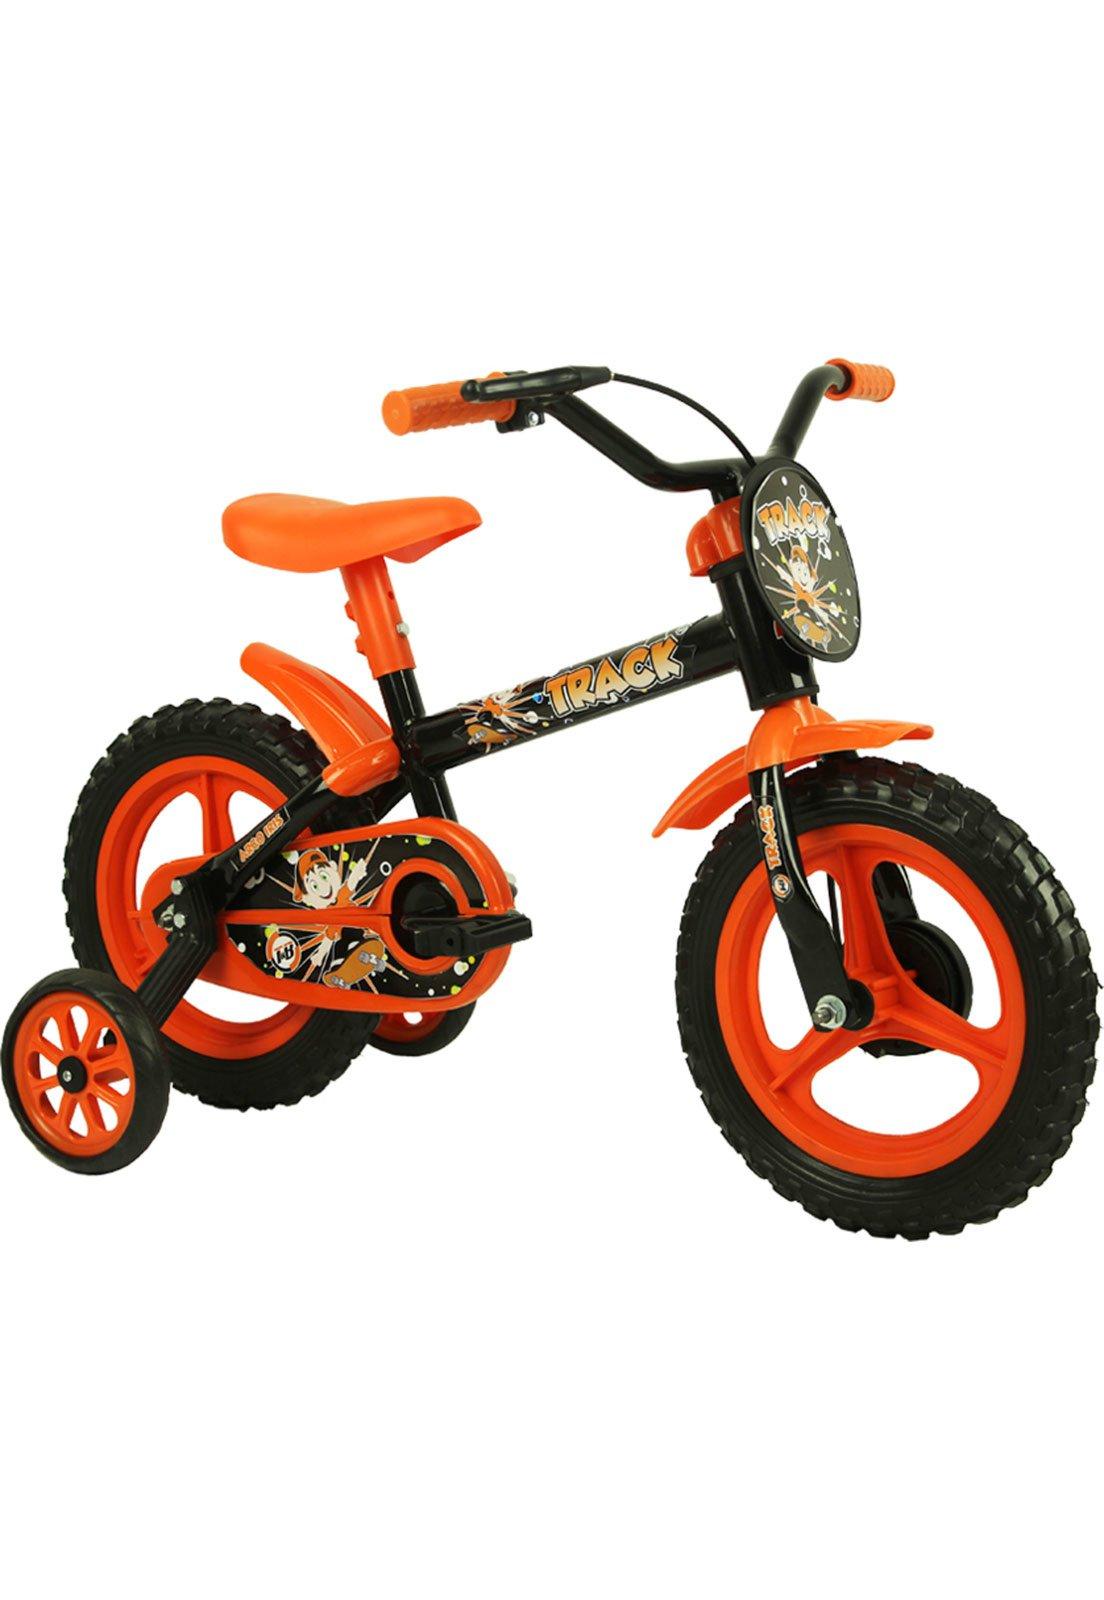 3b2bd687d Bicicleta Aro 12 Tk Preto e Laranja Track Bikes - Compre Agora ...